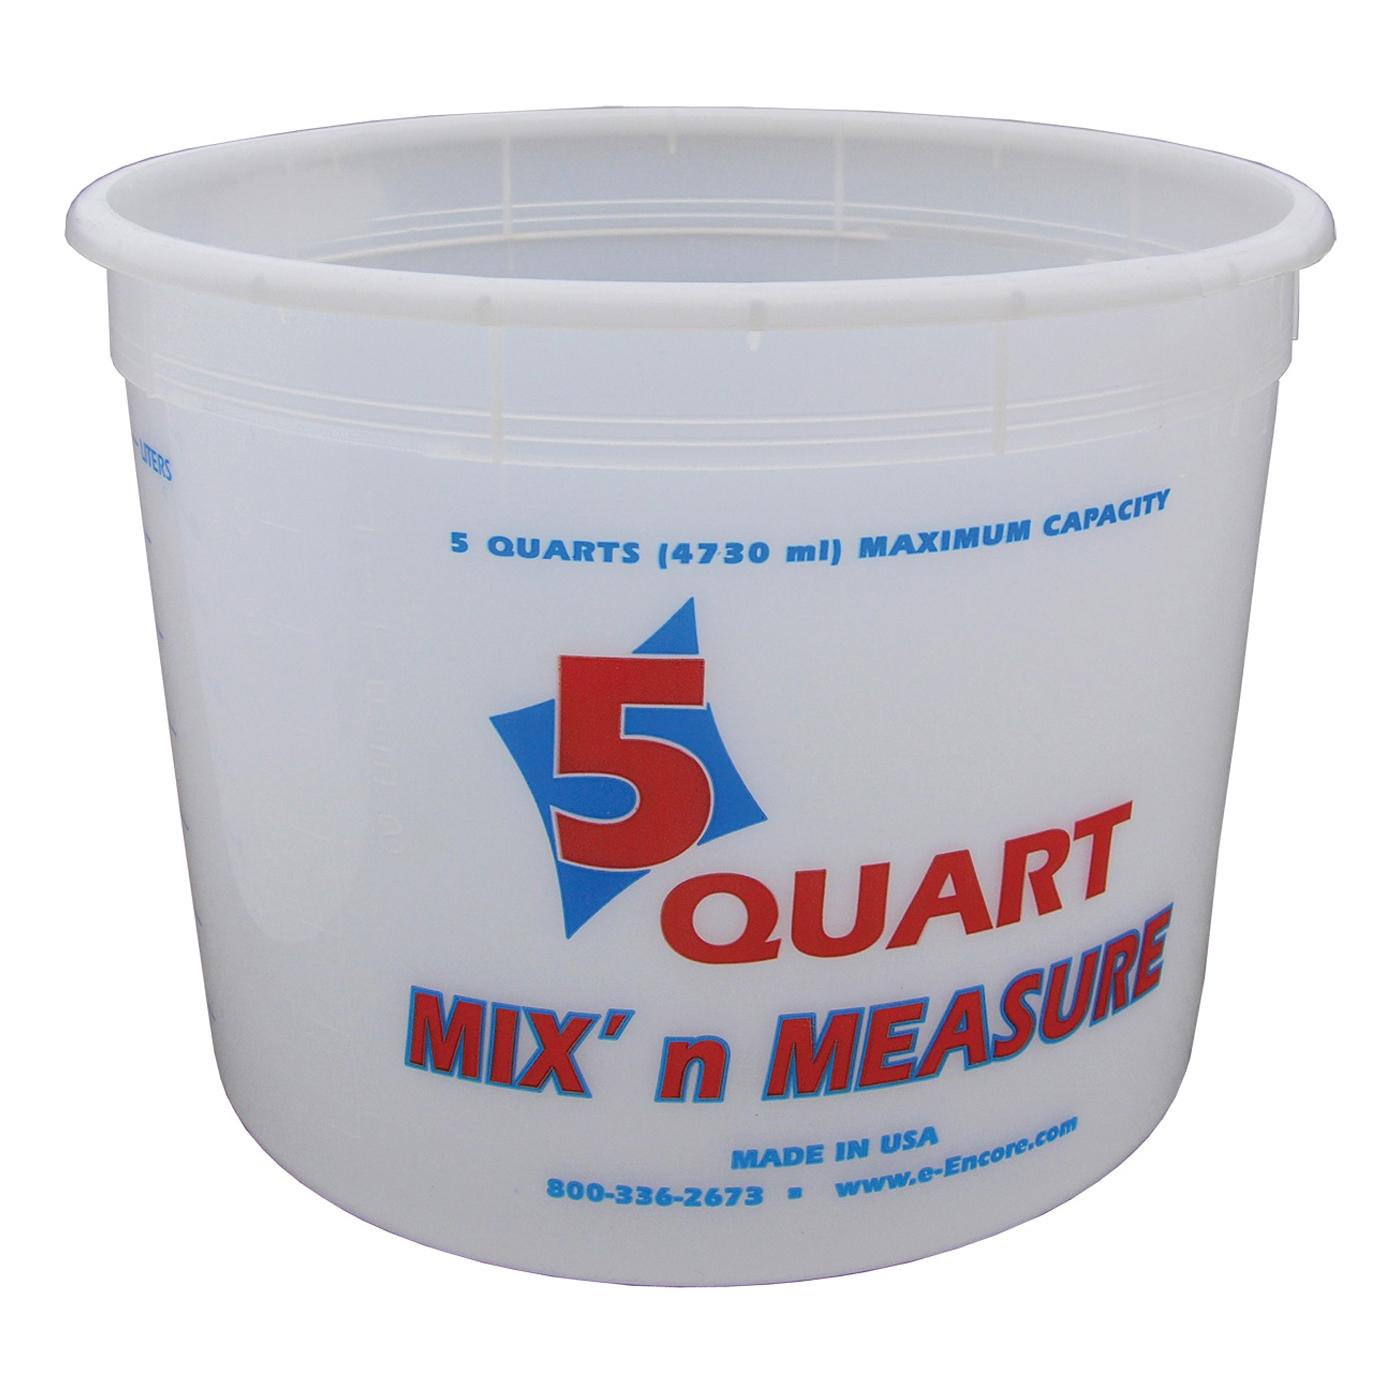 Picture of ENCORE Plastics 300403 Paint Container, 5 qt Capacity, Plastic